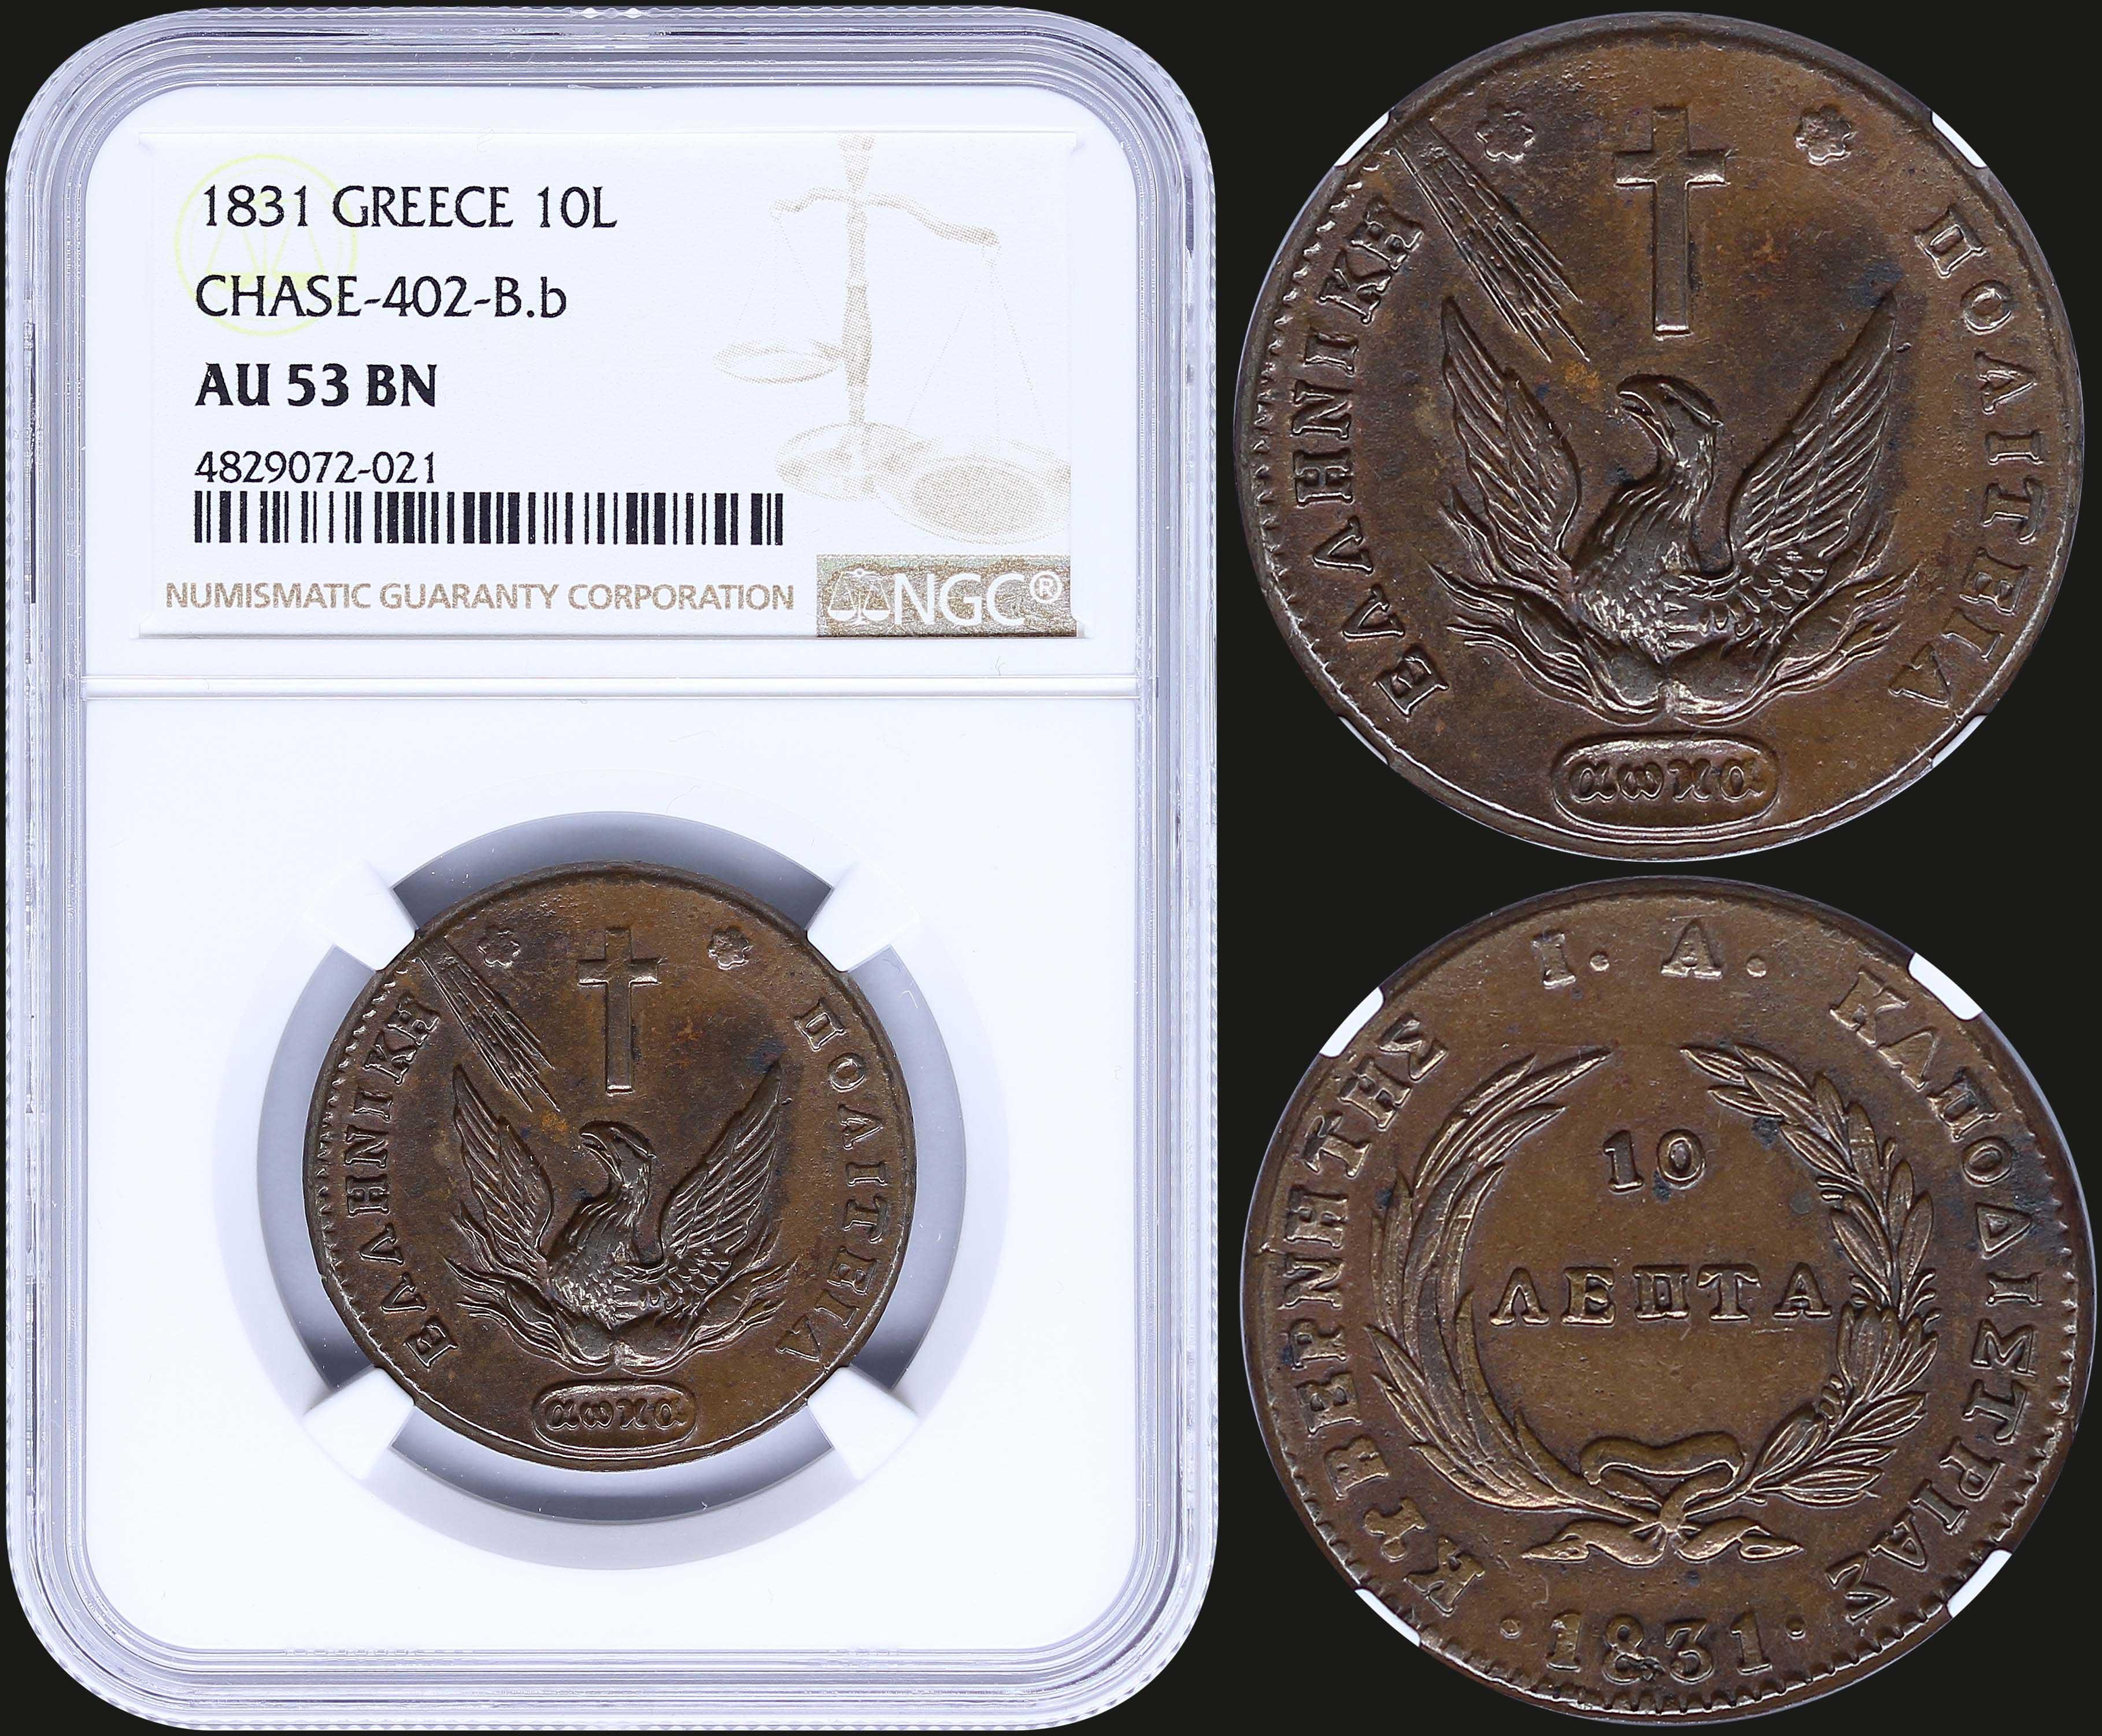 Lot 8034 - -  COINS & TOKENS governor capodistrias -  A. Karamitsos Public & Live Bid Auction 649 Coins, Medals & Banknotes